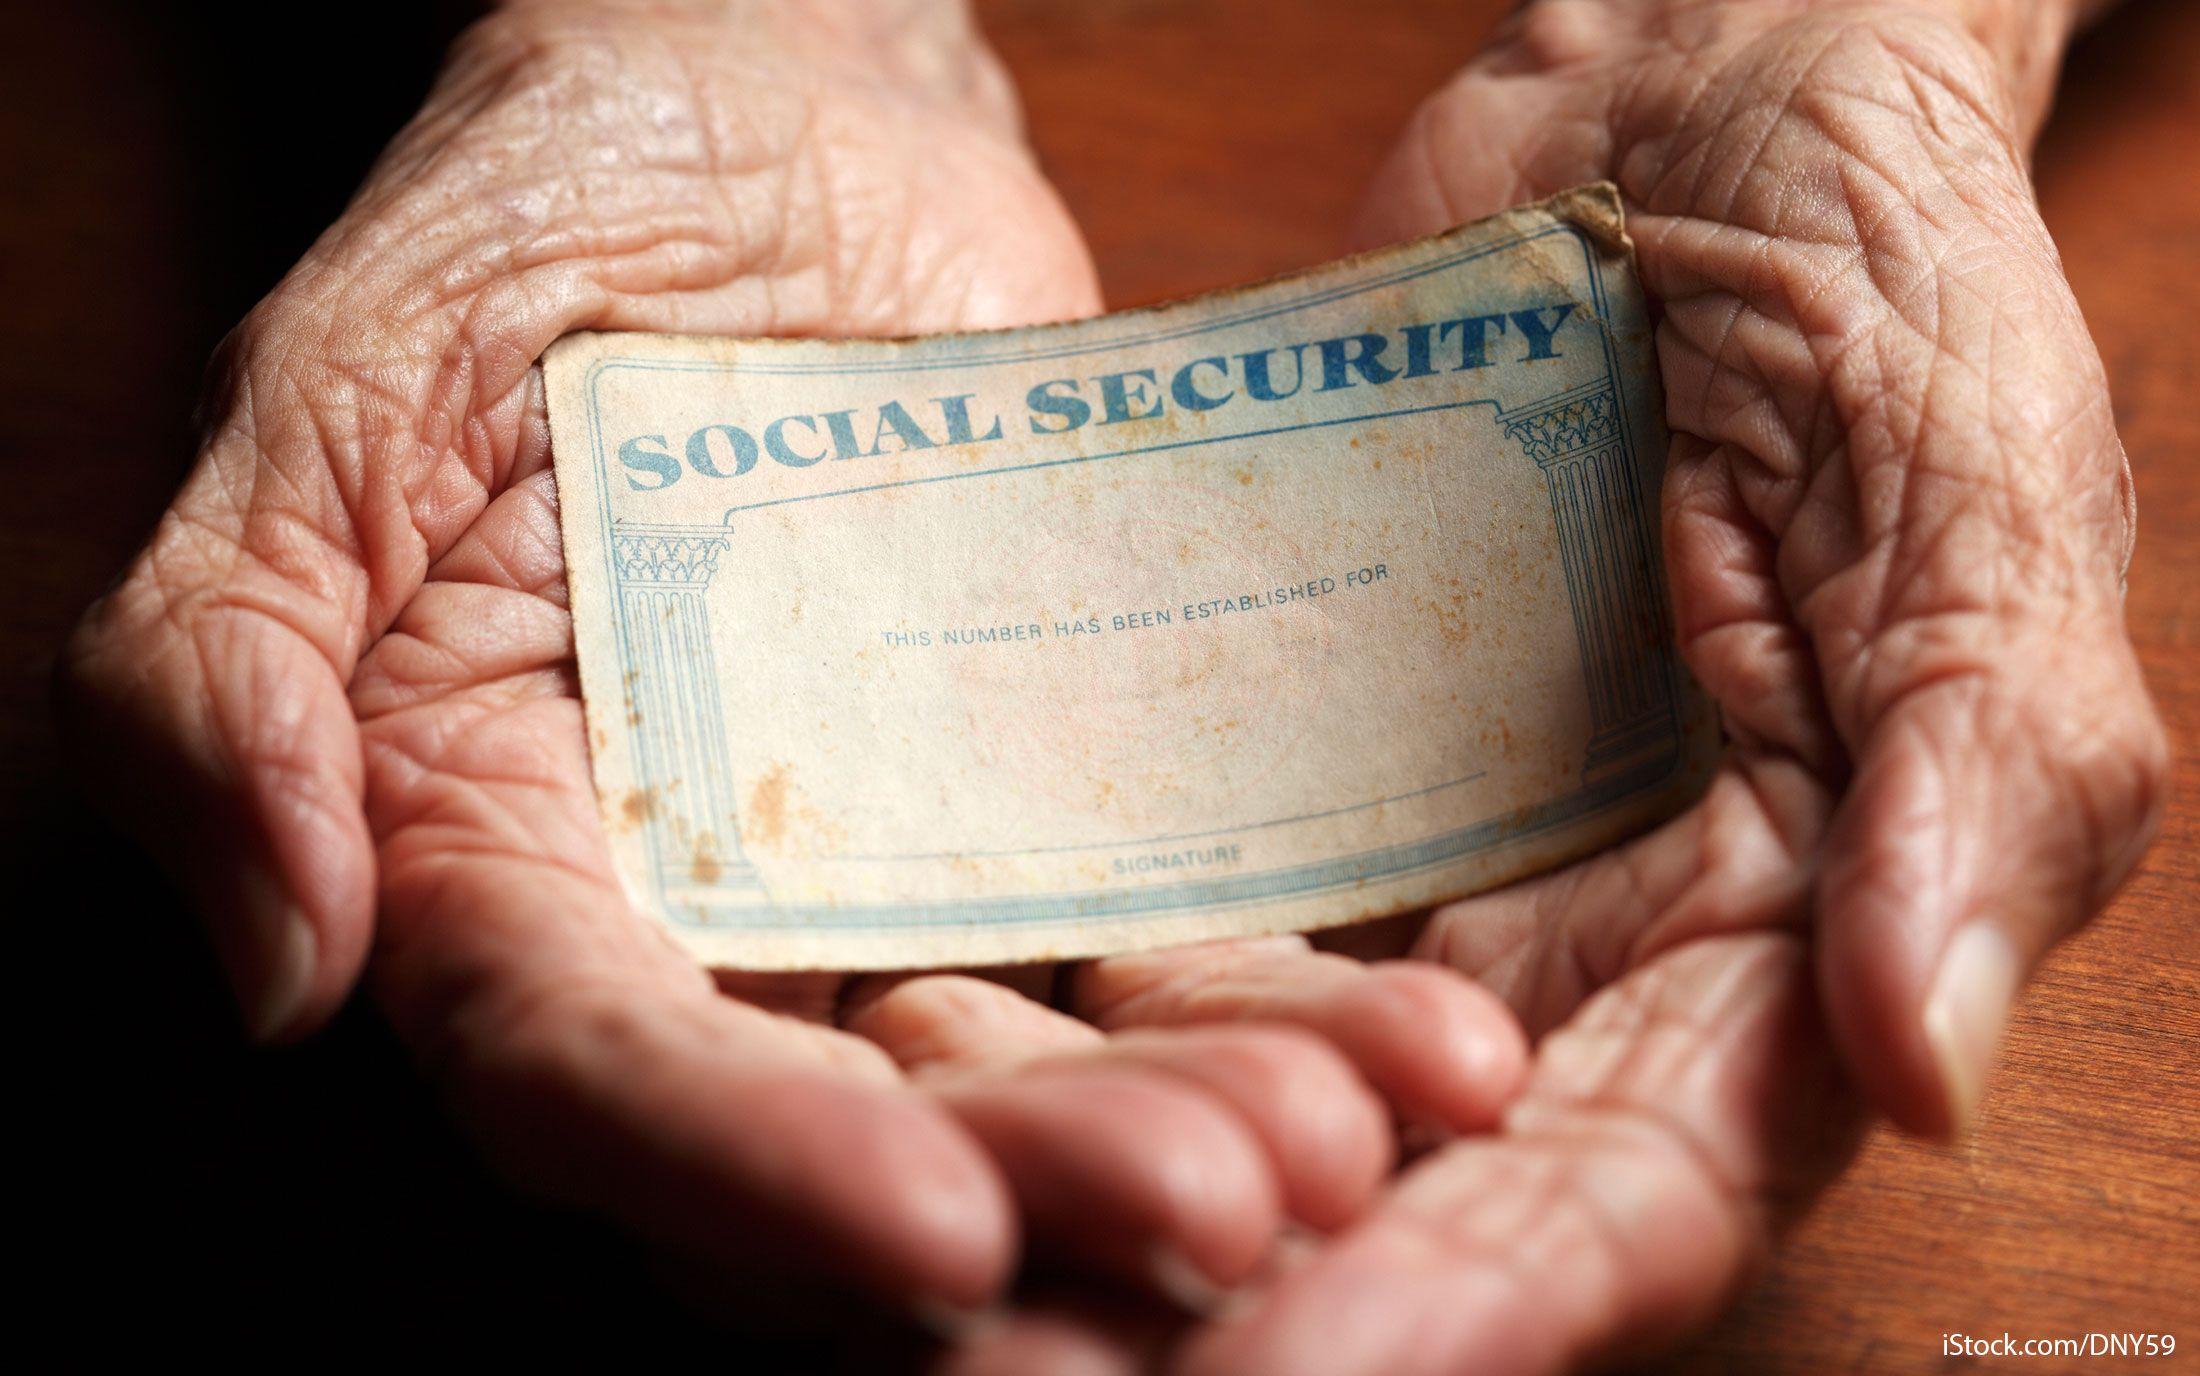 claim social security benefits